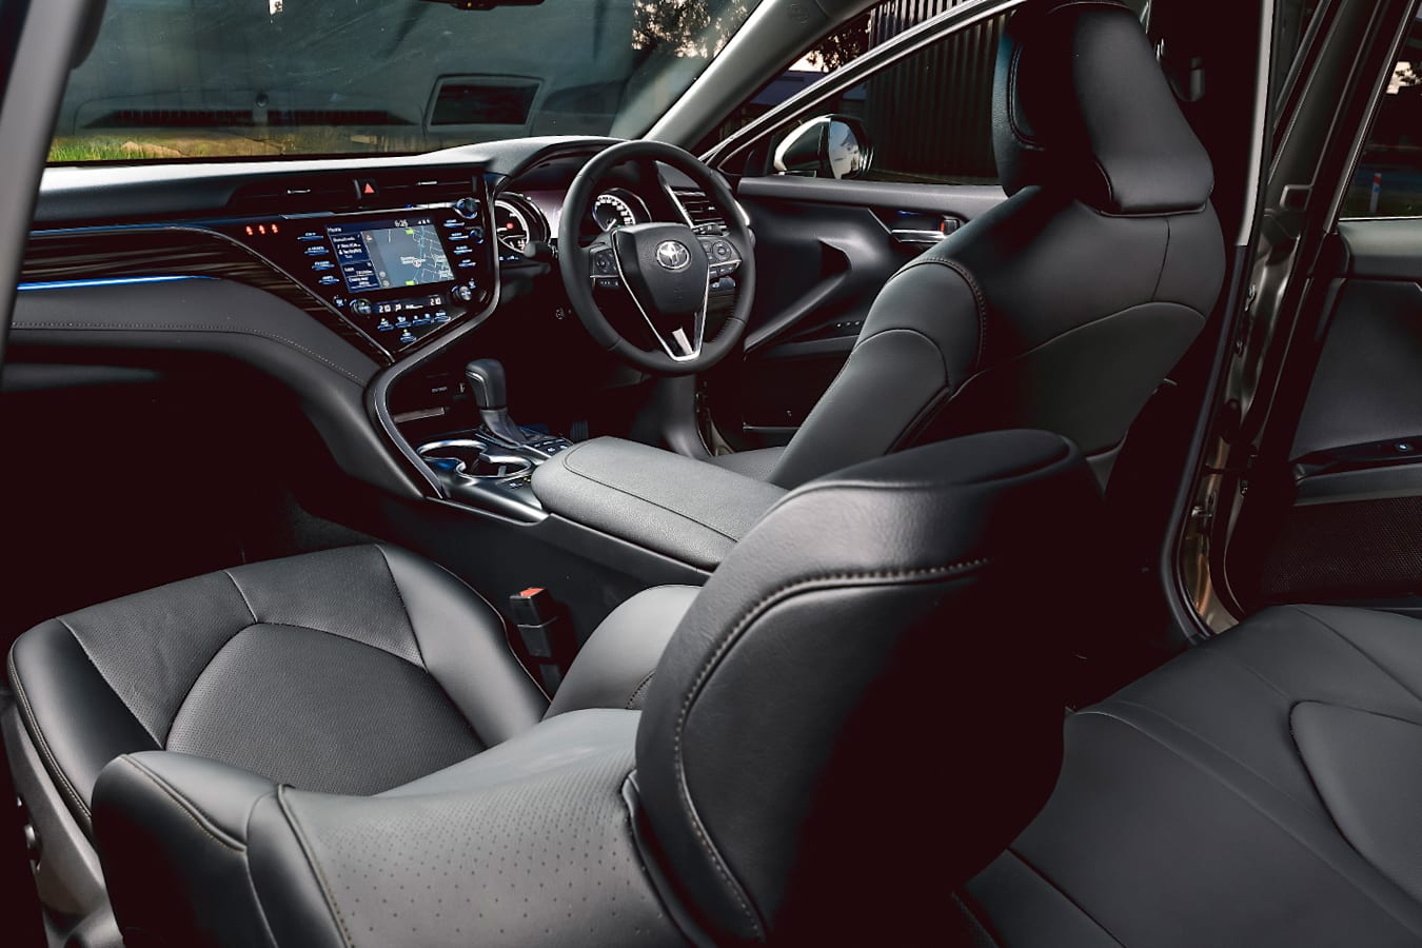 Toyota Camry Hybrid Sl Interior Jpg